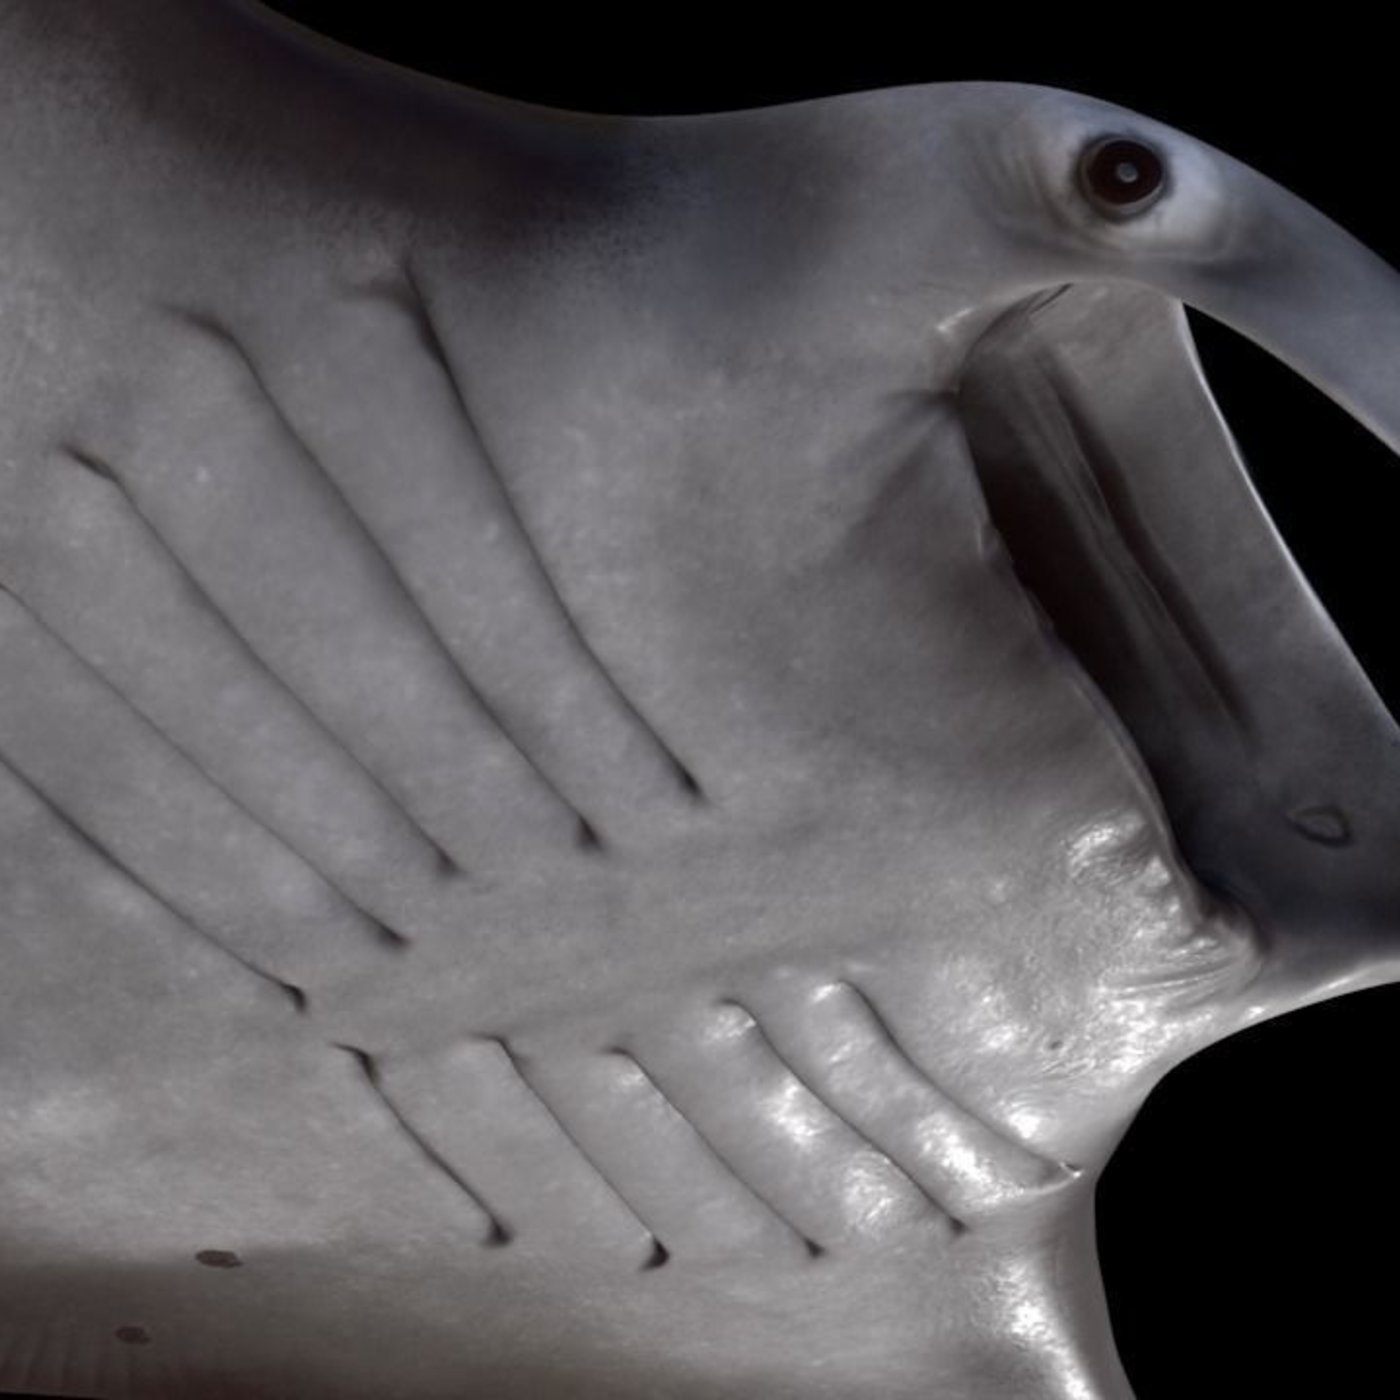 Manta Birostris - The Great Manta Ray